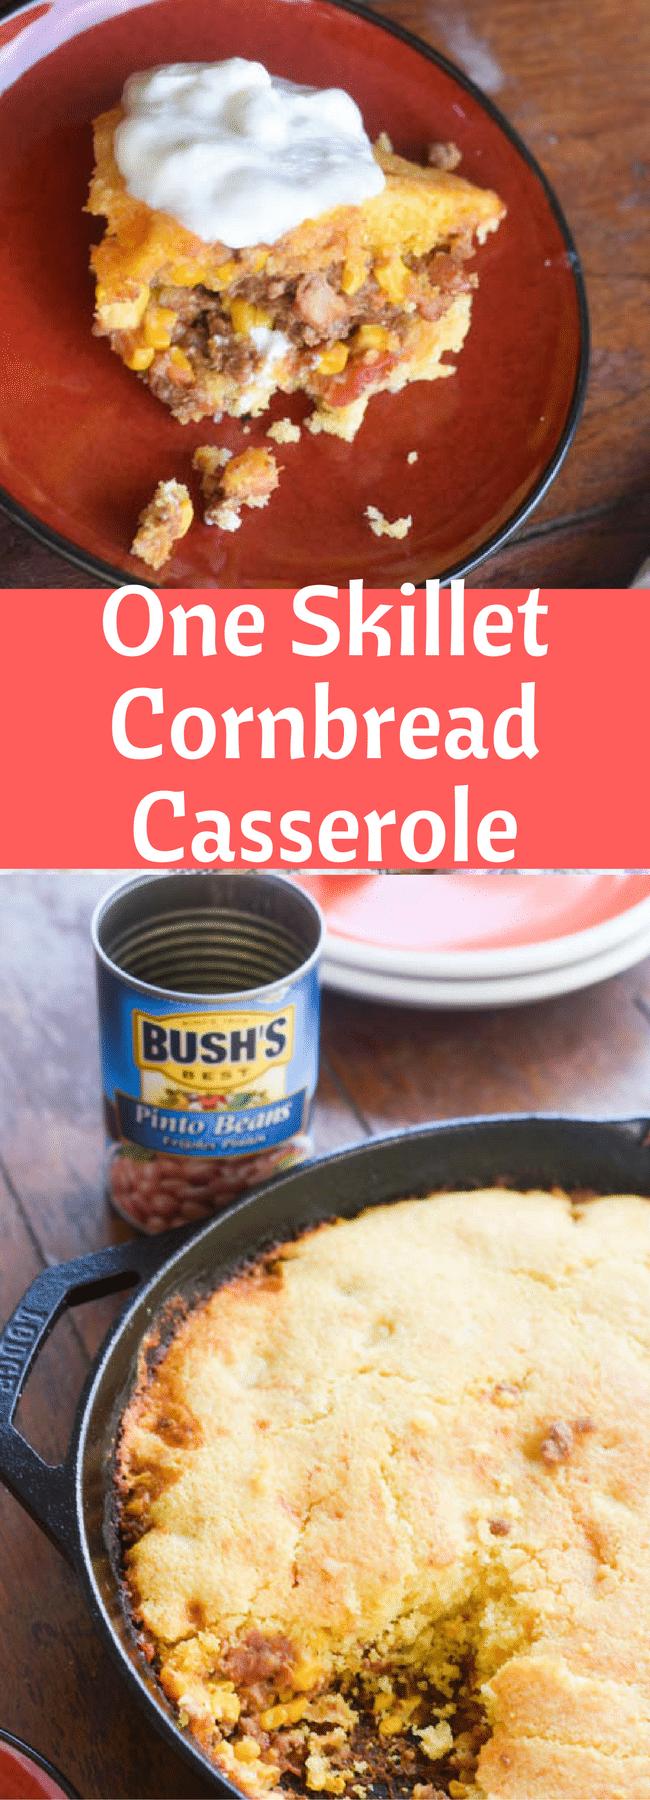 One Skillet Cornbread Casserole / Cornbread / Southwest Casserole / One Skillet Meal / One Pot Meal / Tamale Pie